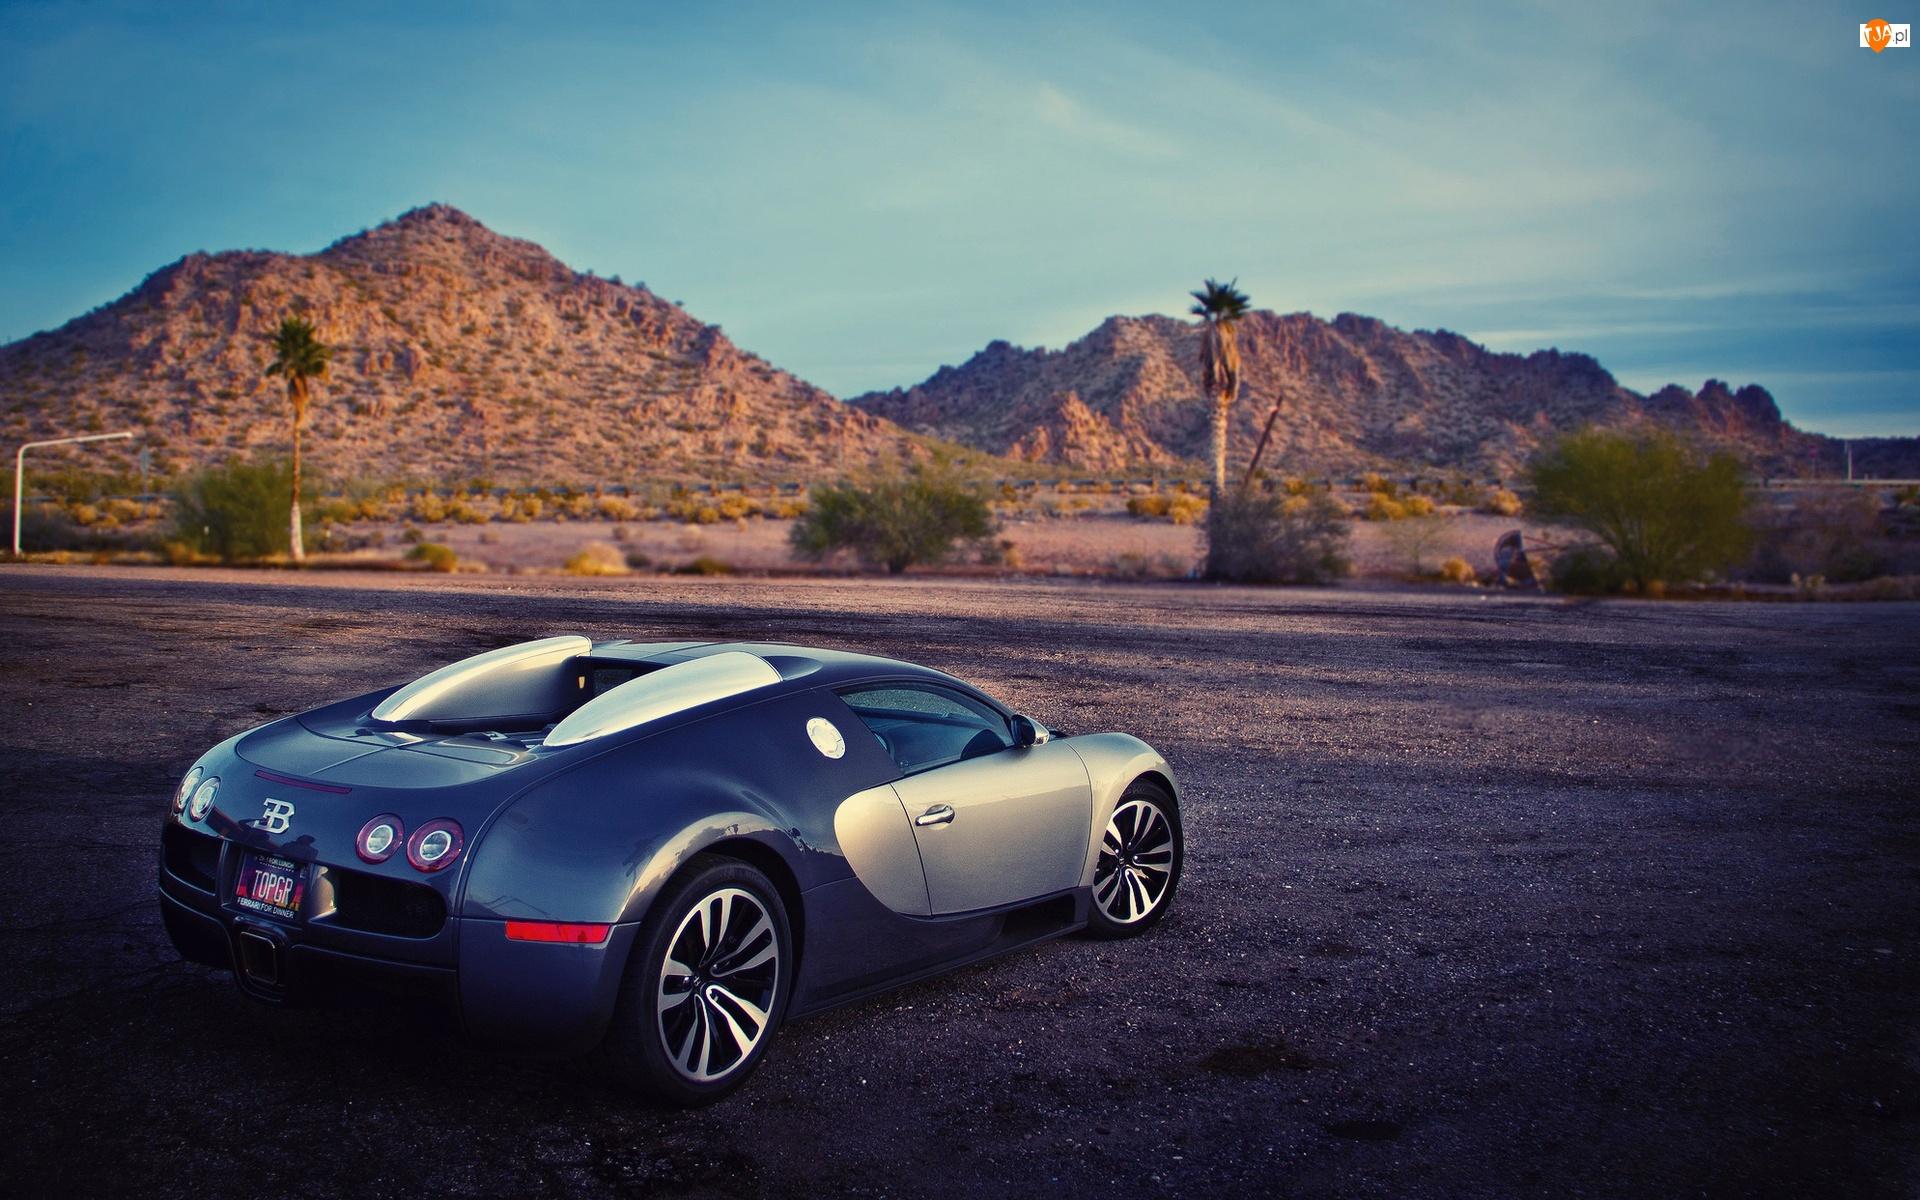 Bugatti, Wzgórze, Veyron, Droga